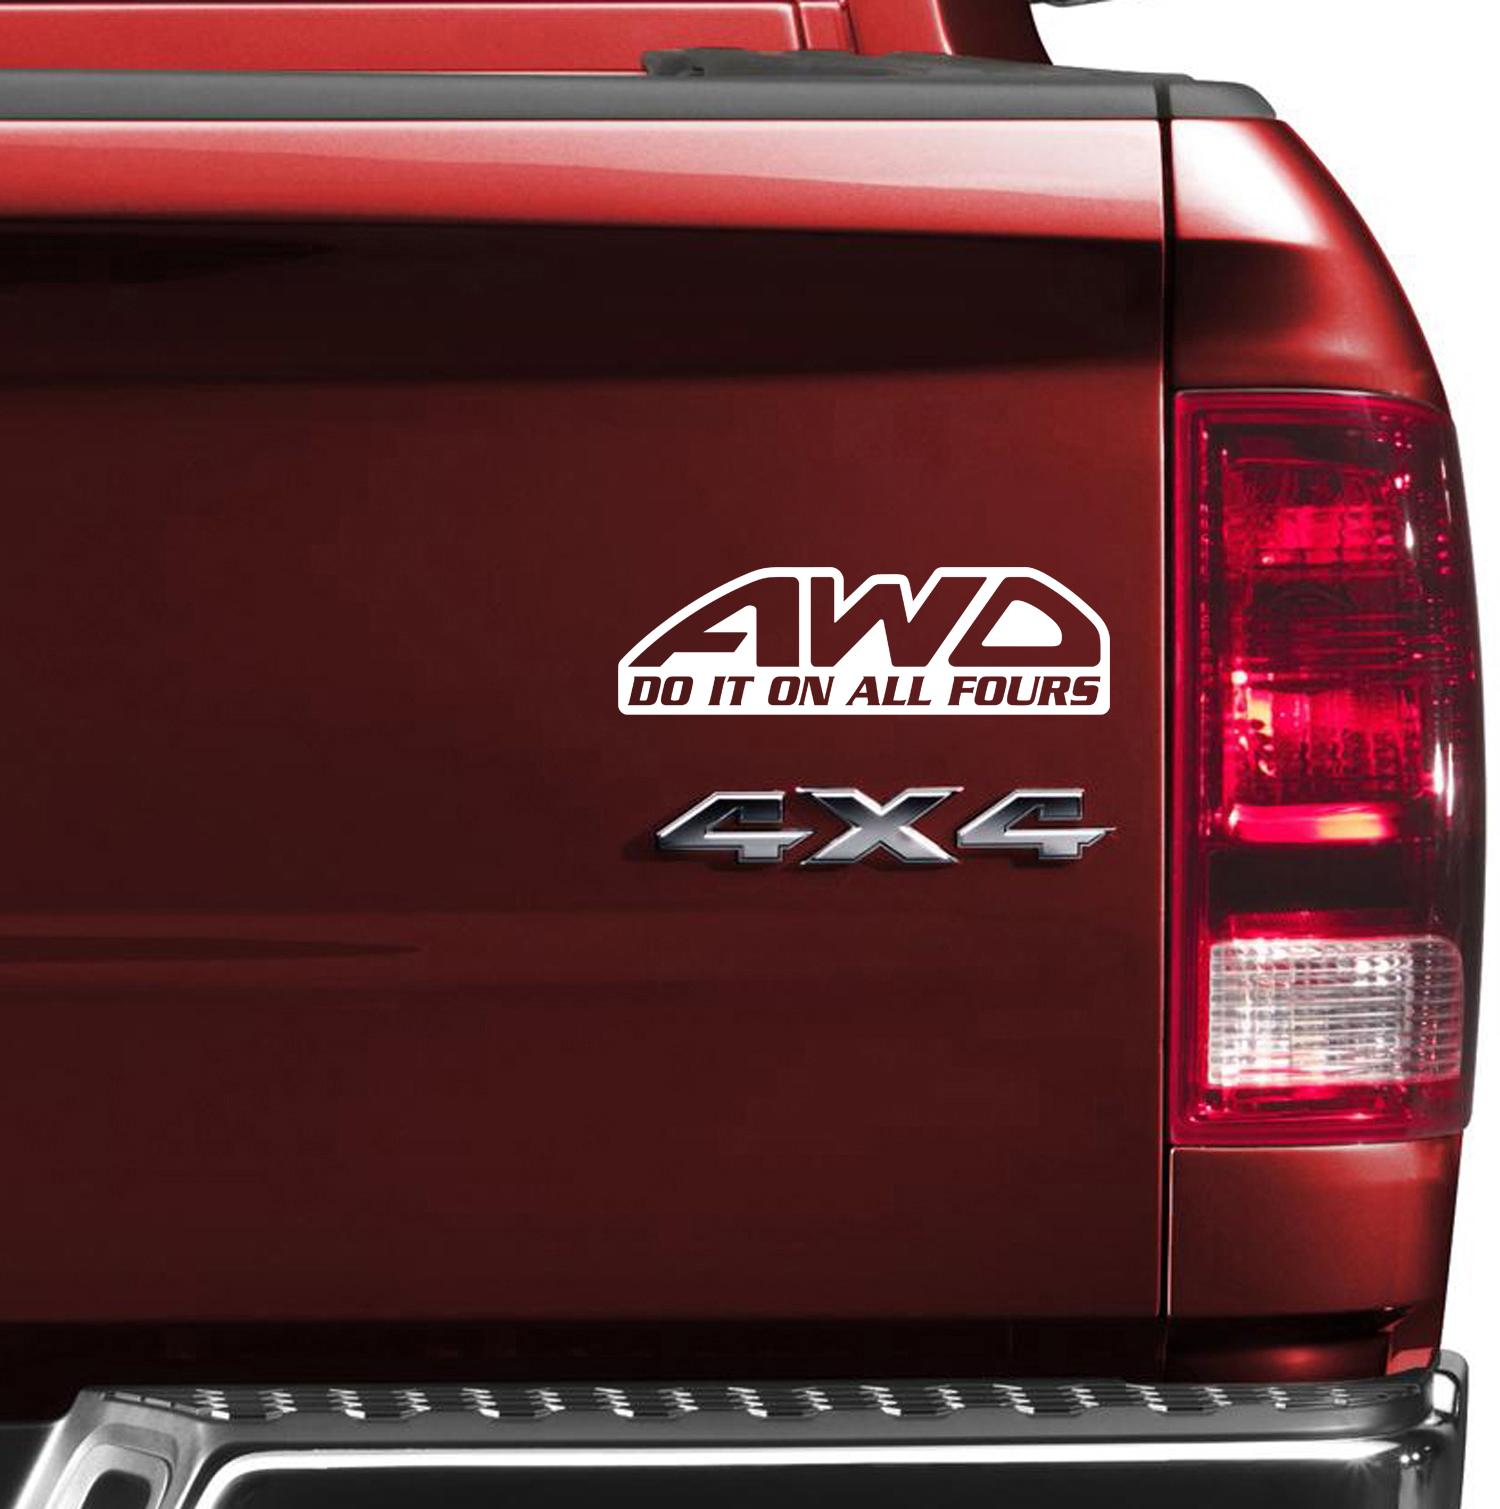 Buy Window Body Banner Girls Drive Trucks Too Woman Funny SUV X - Window vinyl stickers